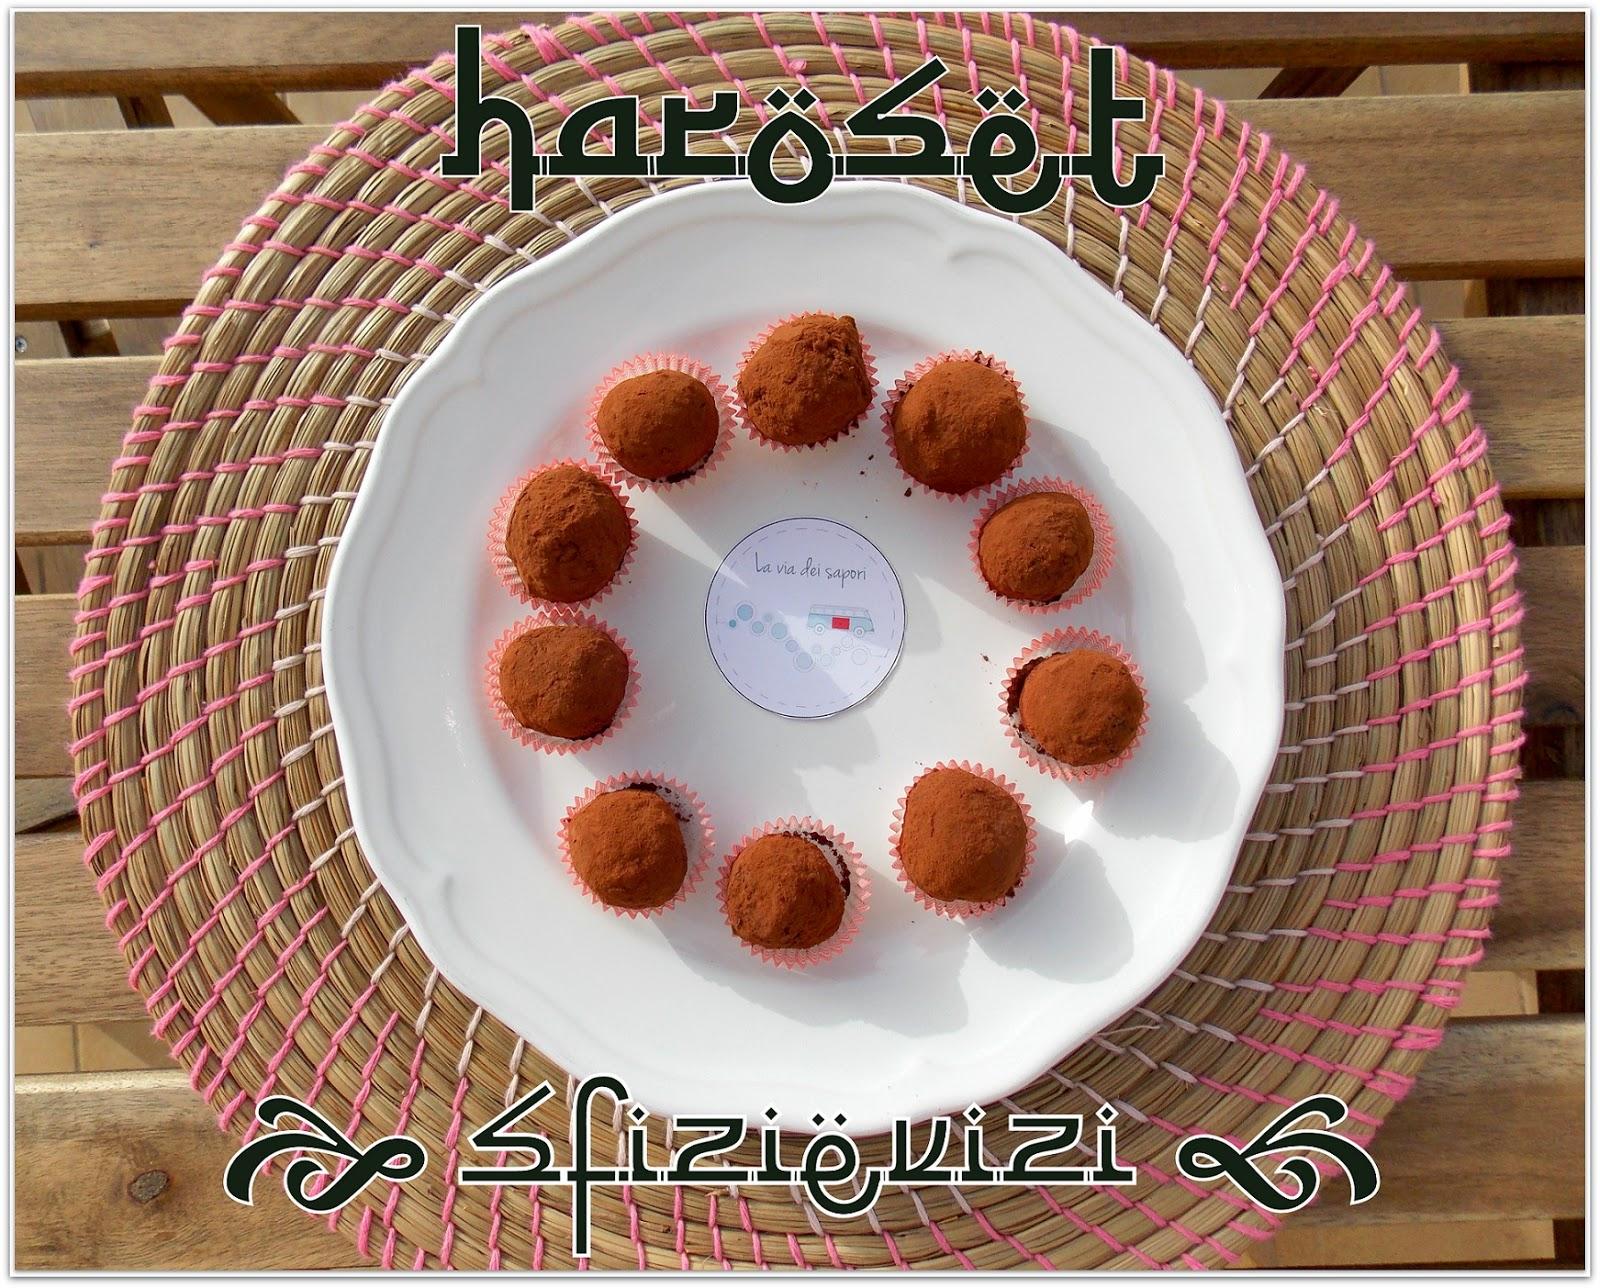 haroset - moroccan truffles with dates, almonds and apples - vegan recipe with the natural fruit sugar - tartufi marocchini con datteri, mandorle e mele - ricetta vegana, senza glutine e senza zuccheri aggiunti